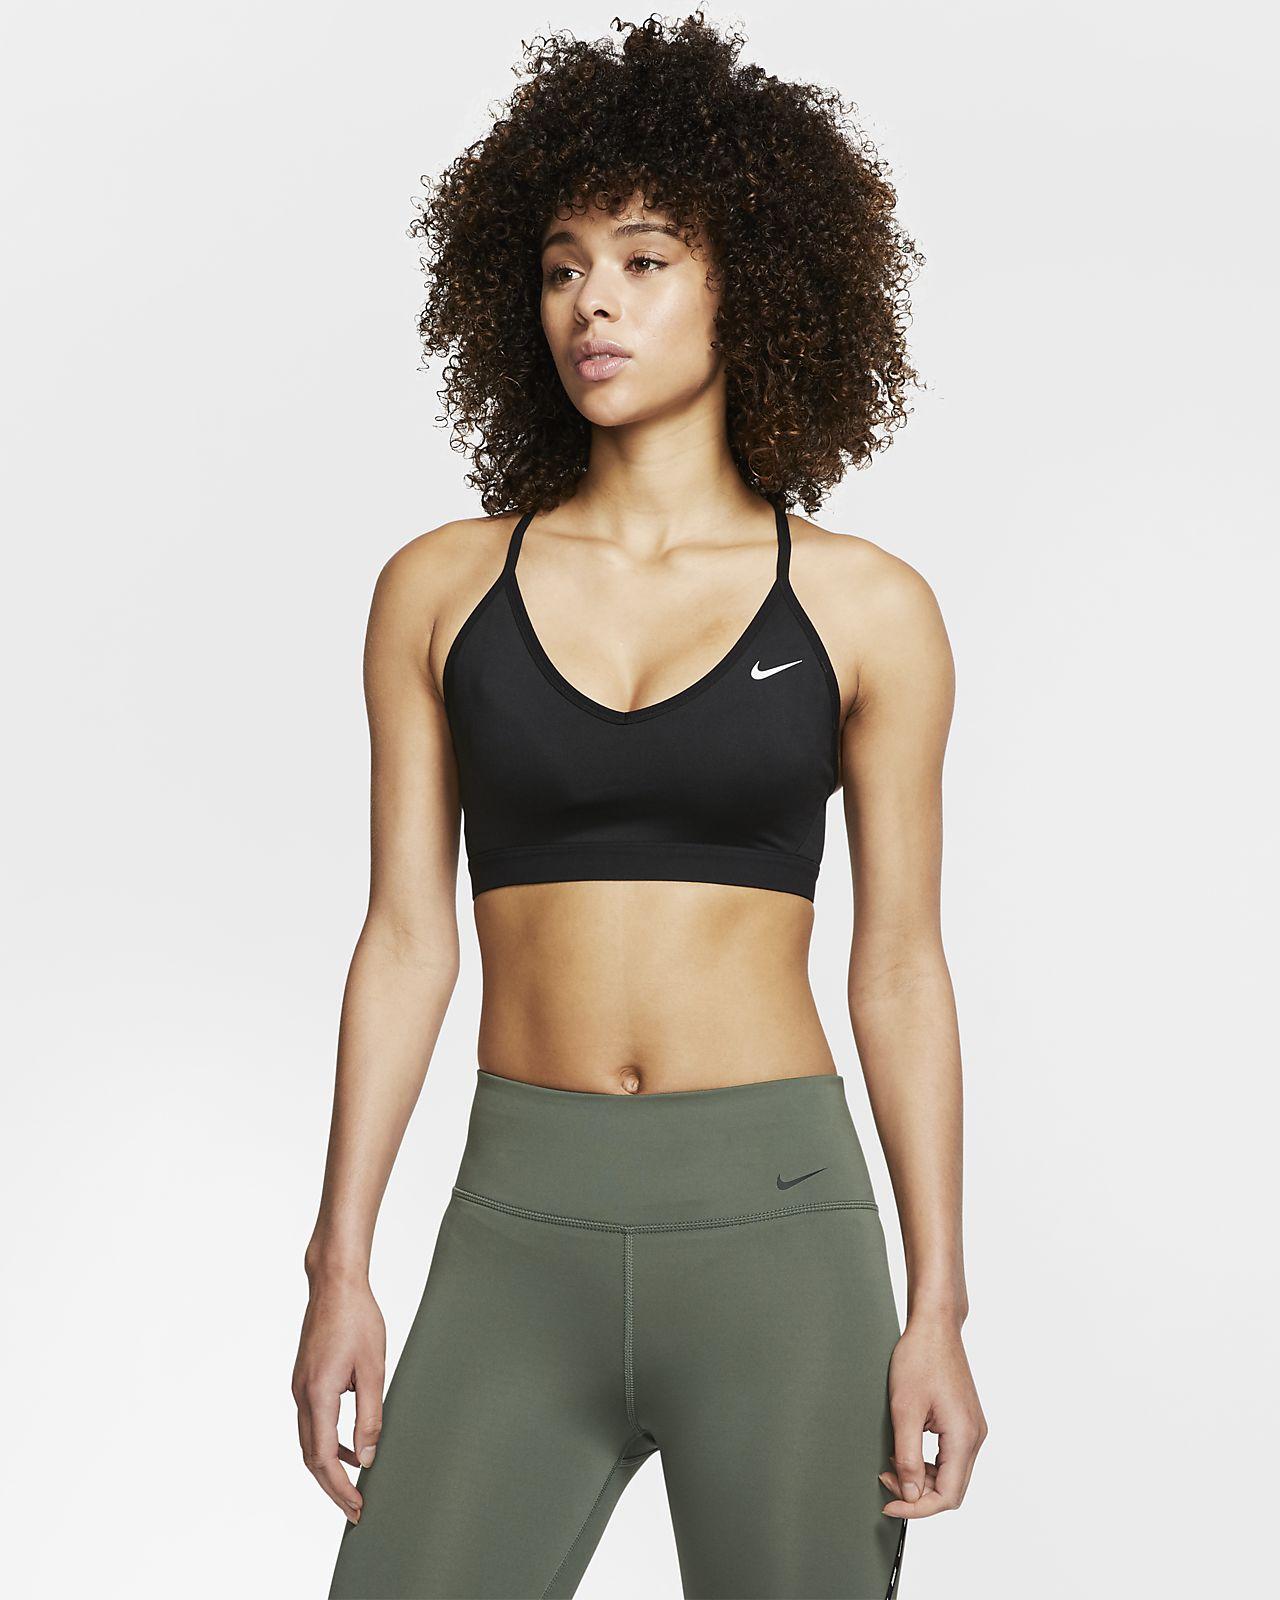 Nike Indy Women's Light-Support Padded Sports Bra